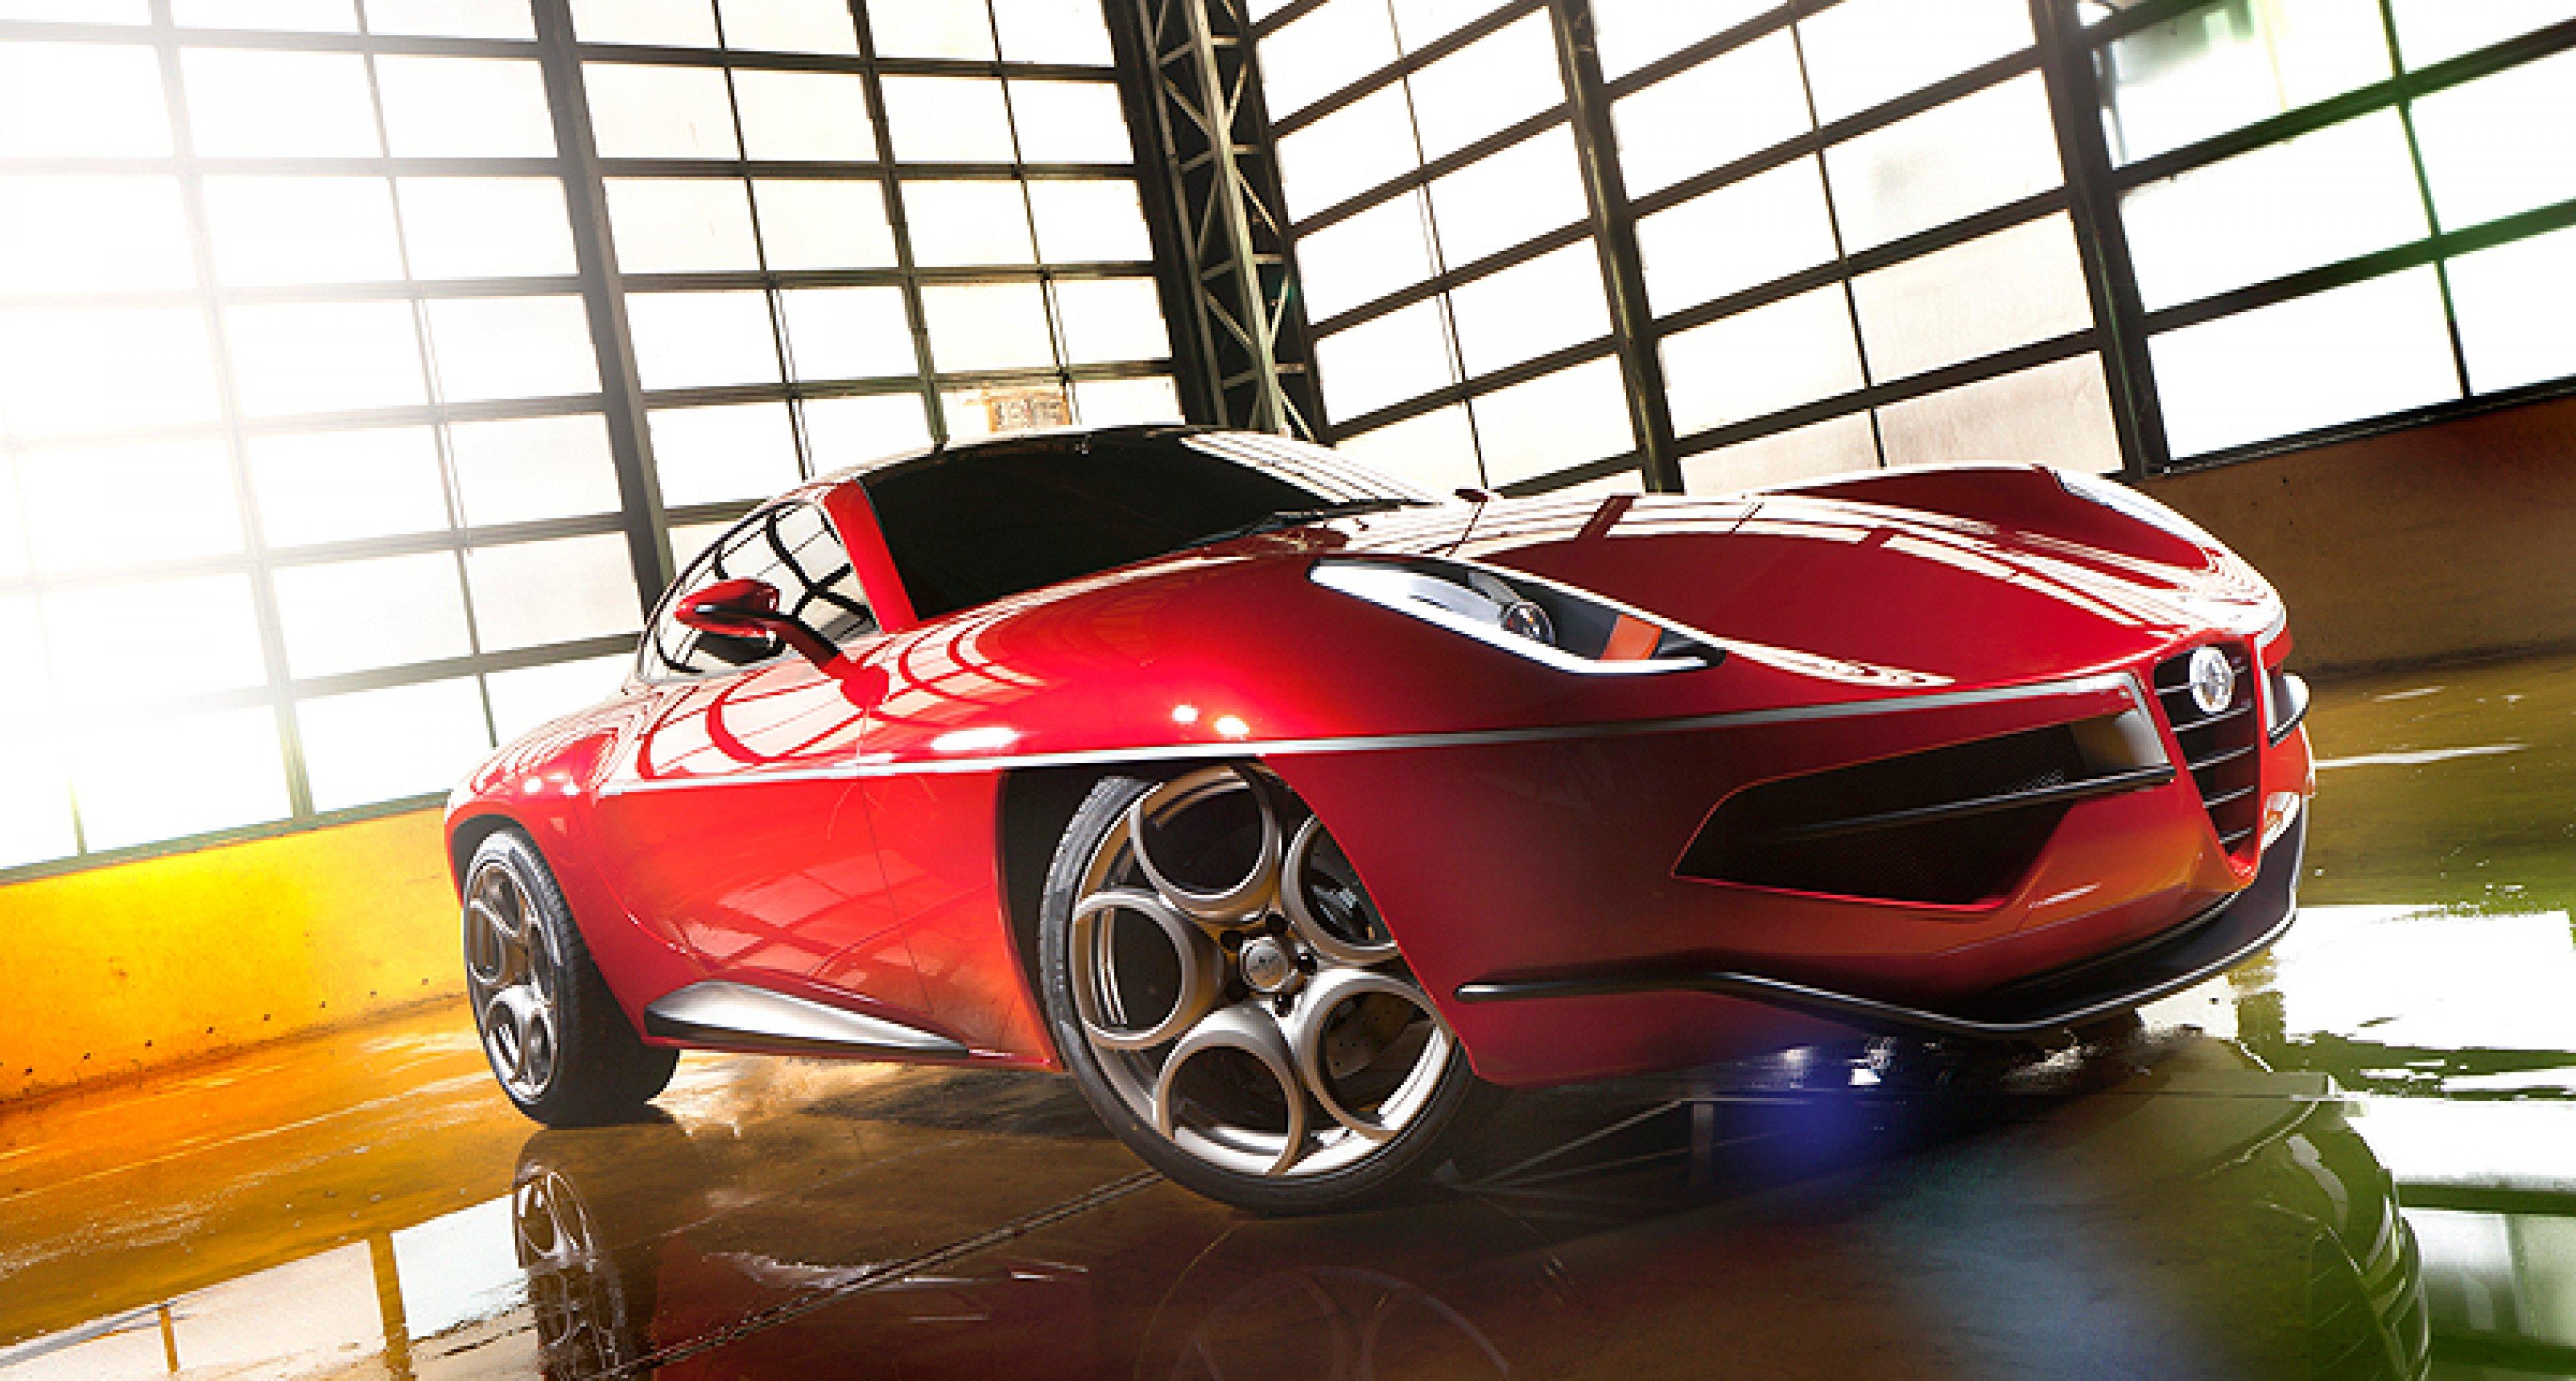 Carrozzeria Touring Disco Volante 2012: Rückkehr der Untertasse